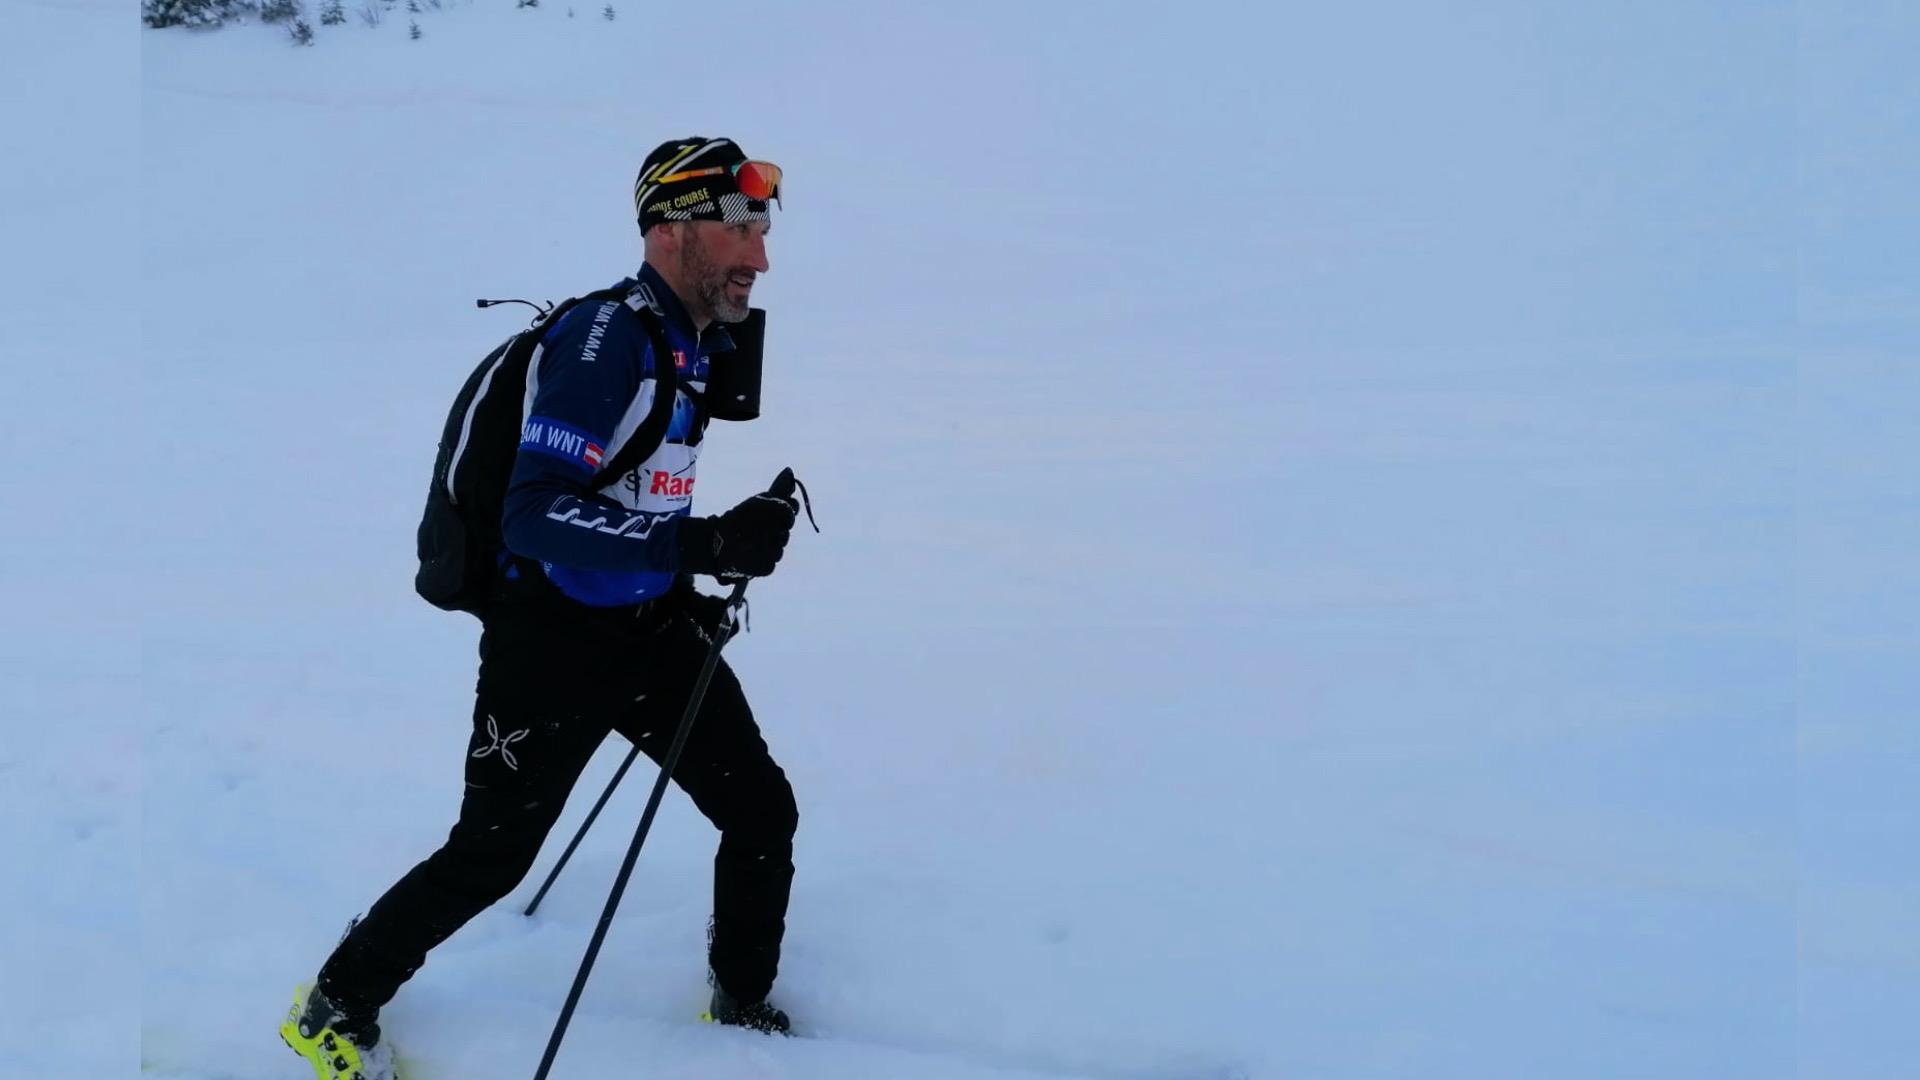 Den Mount Everest in Tirol besteigen